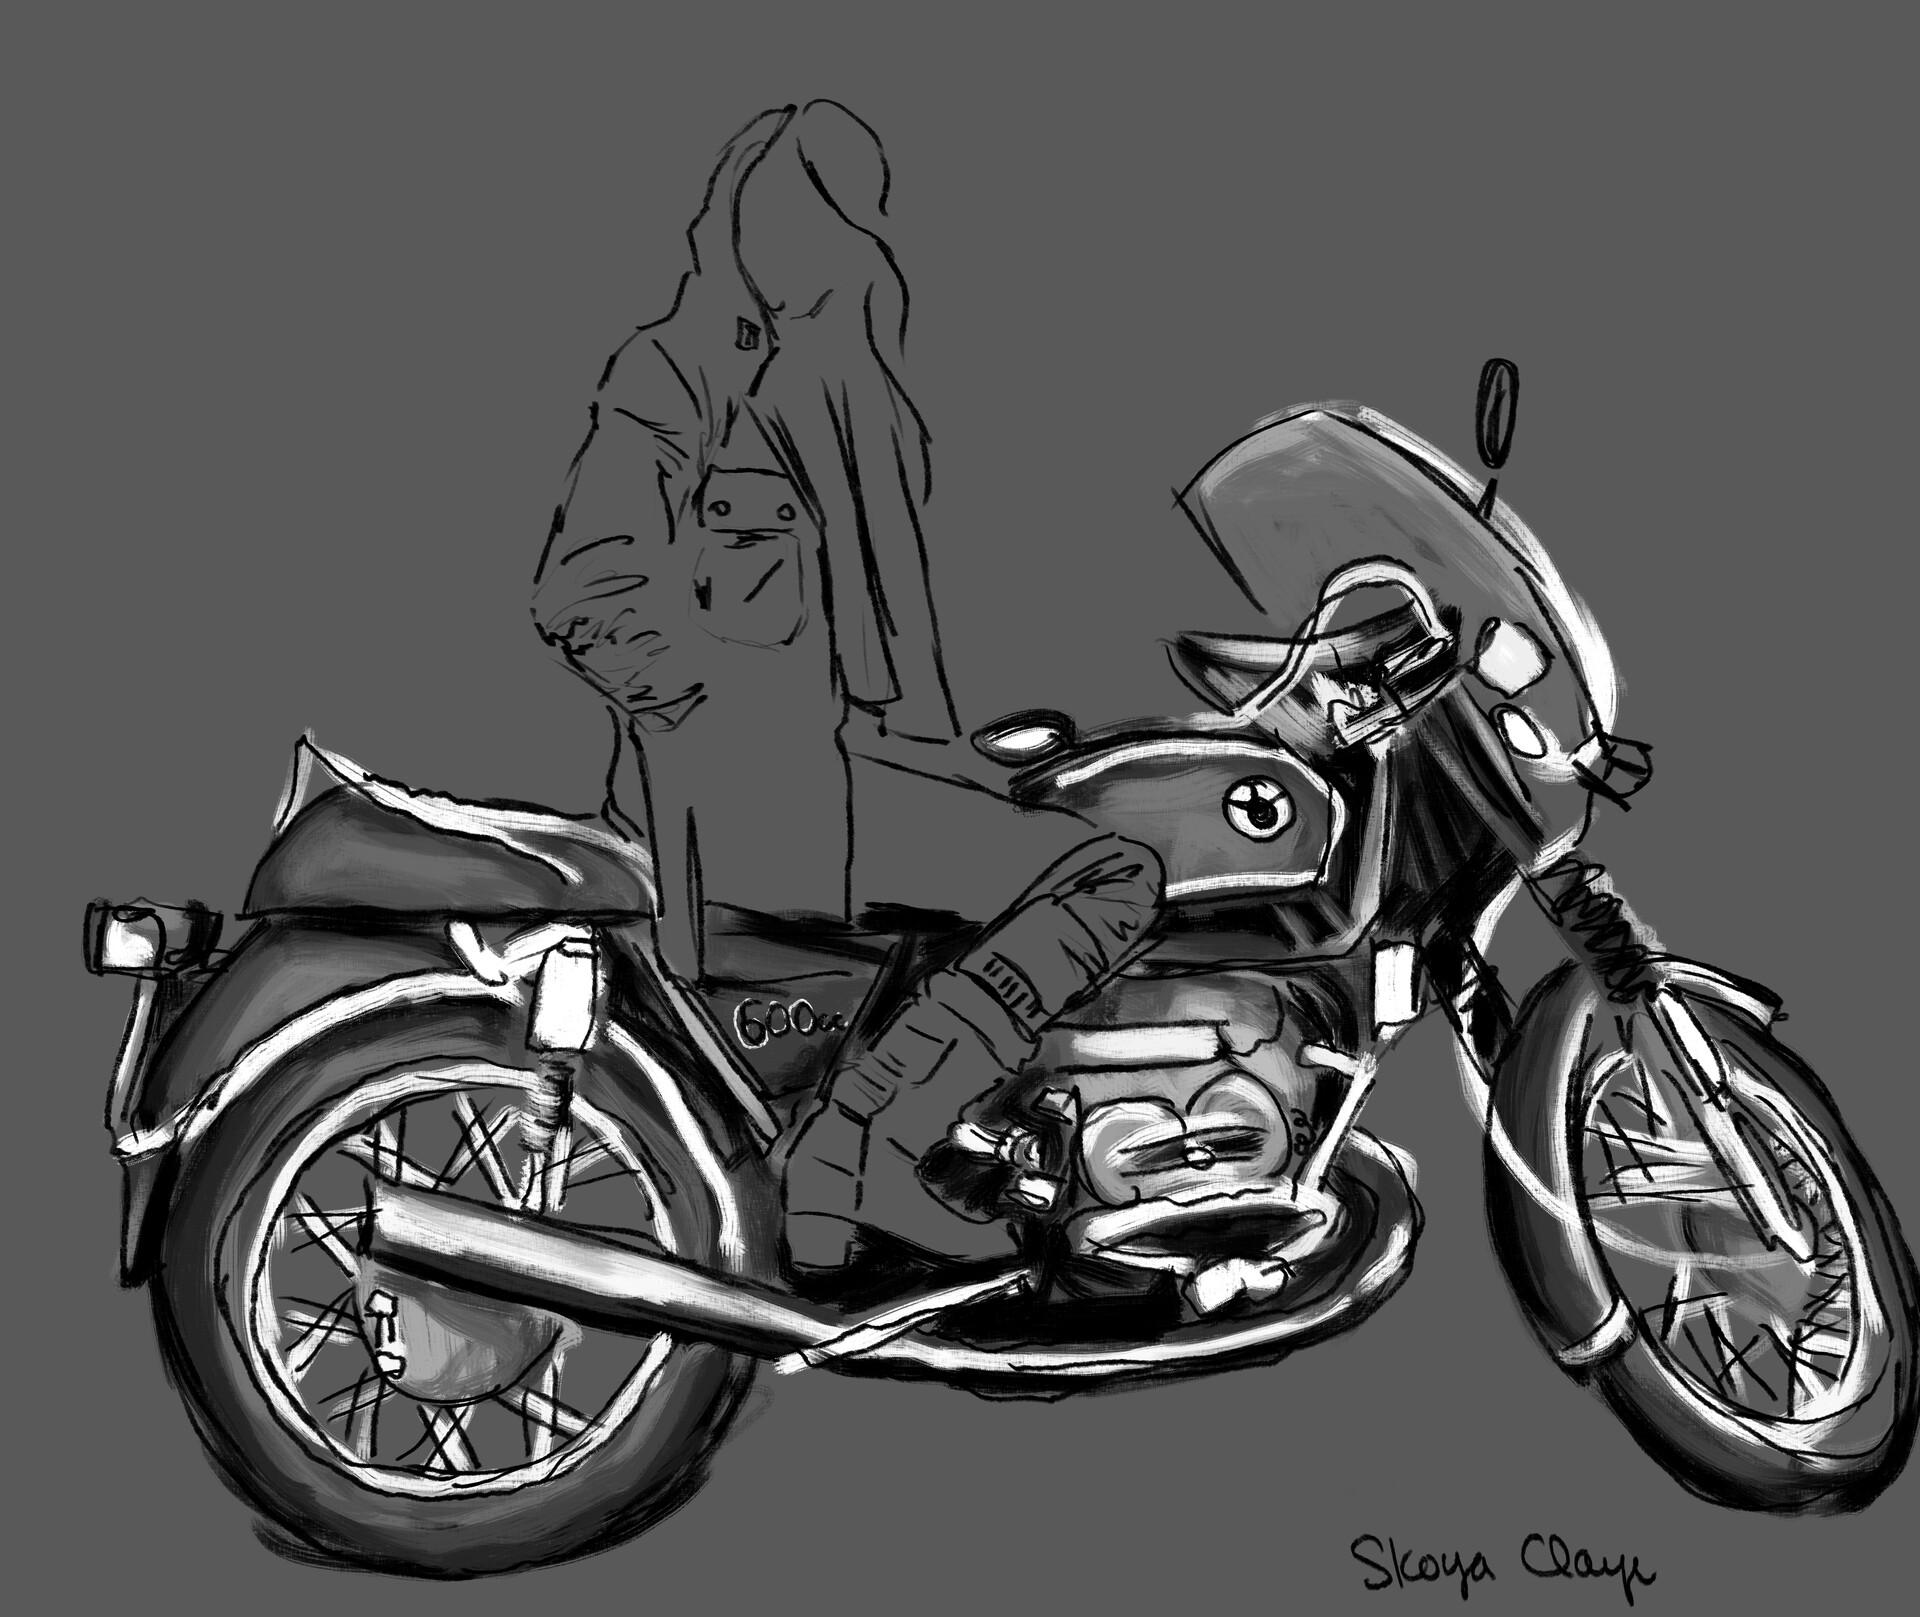 Skoya clayr motorcyclebabe1